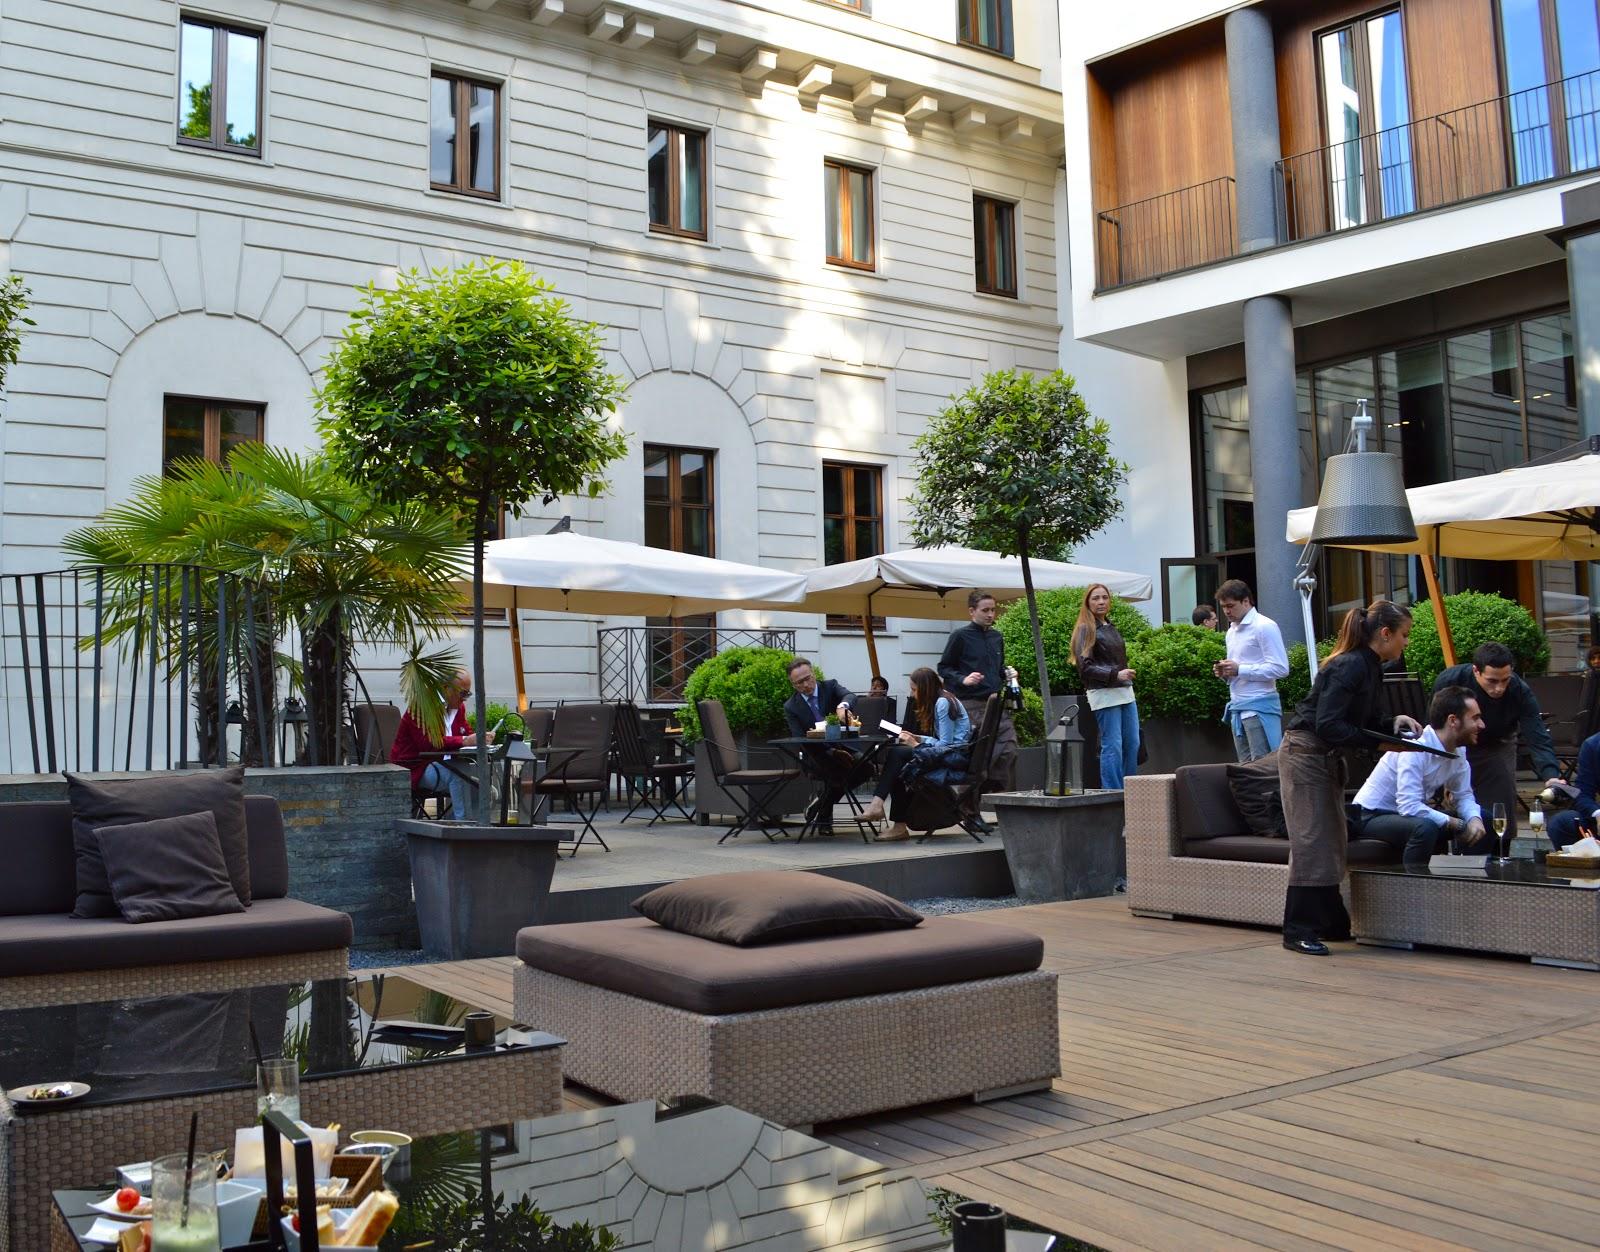 milan italy aperitivo at the bulgari hotel